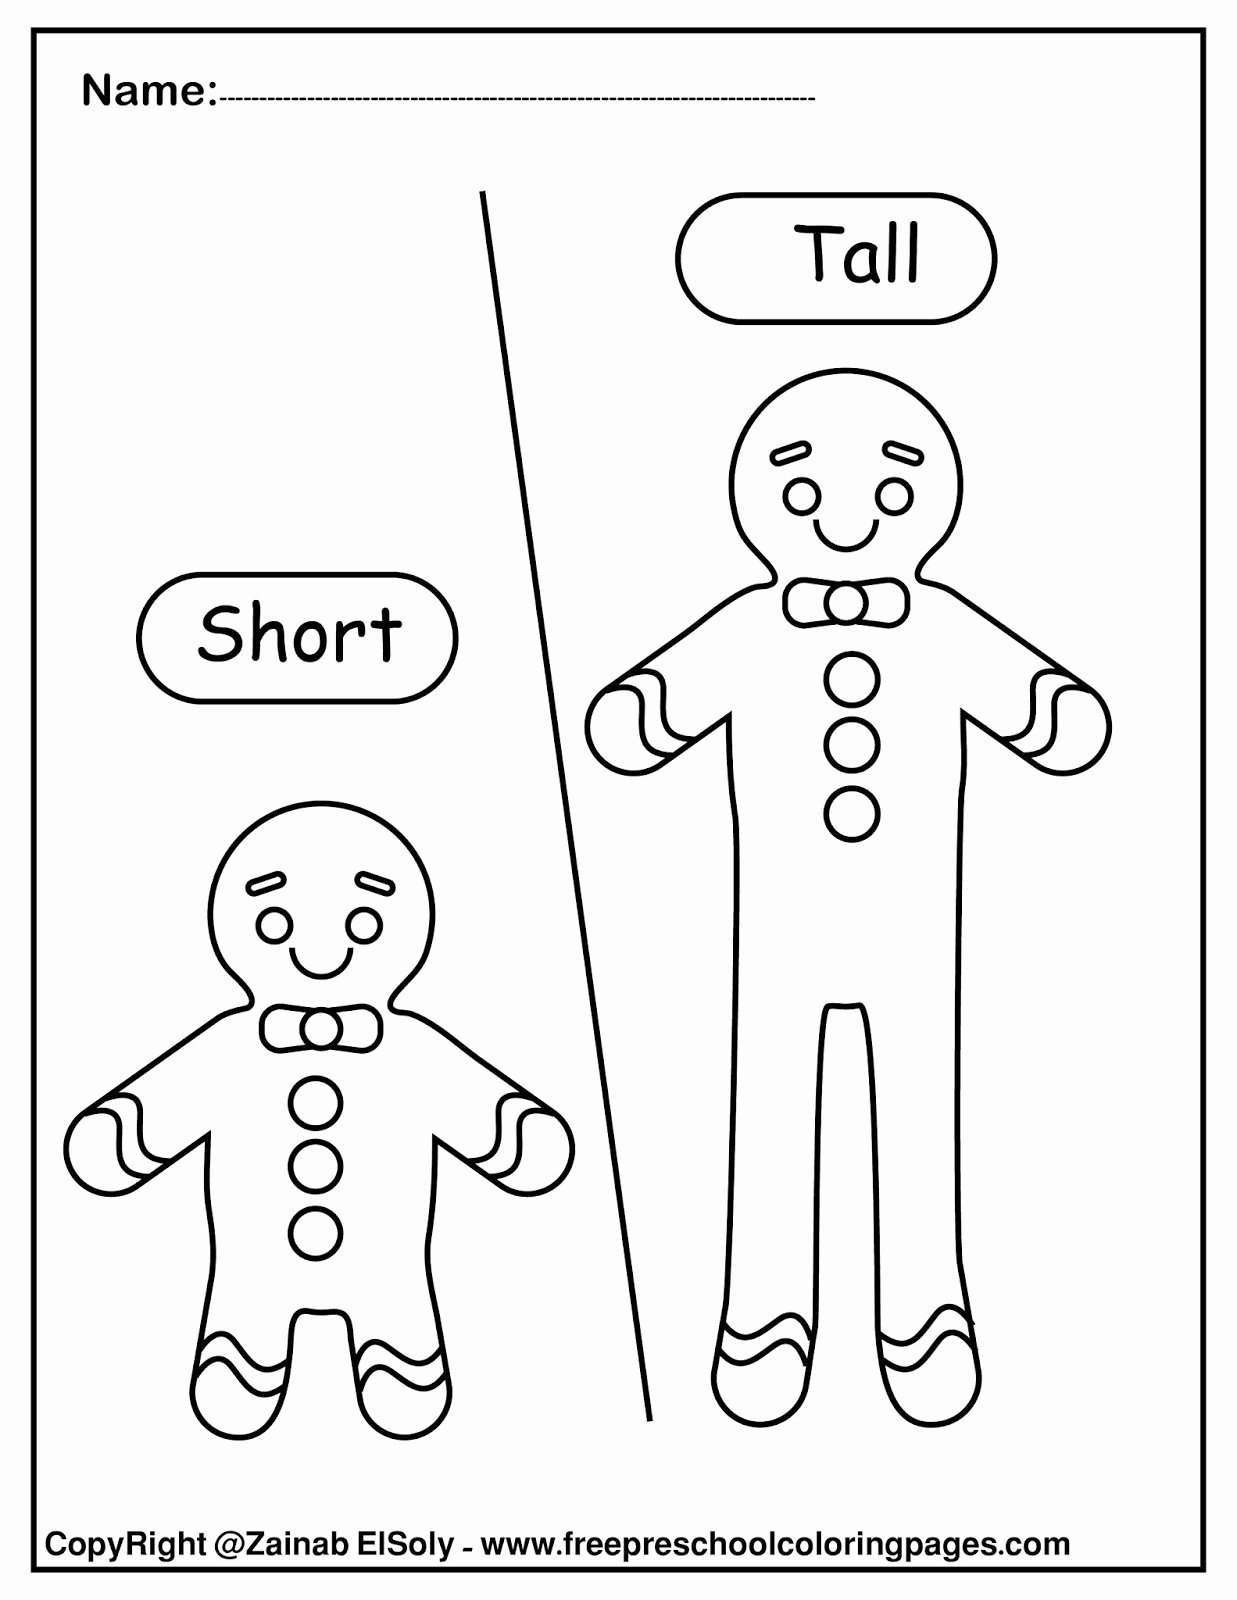 Opposite Worksheets for Preschoolers Best Of Worksheets Set Gingerbread Man Opposites for Kids Pre